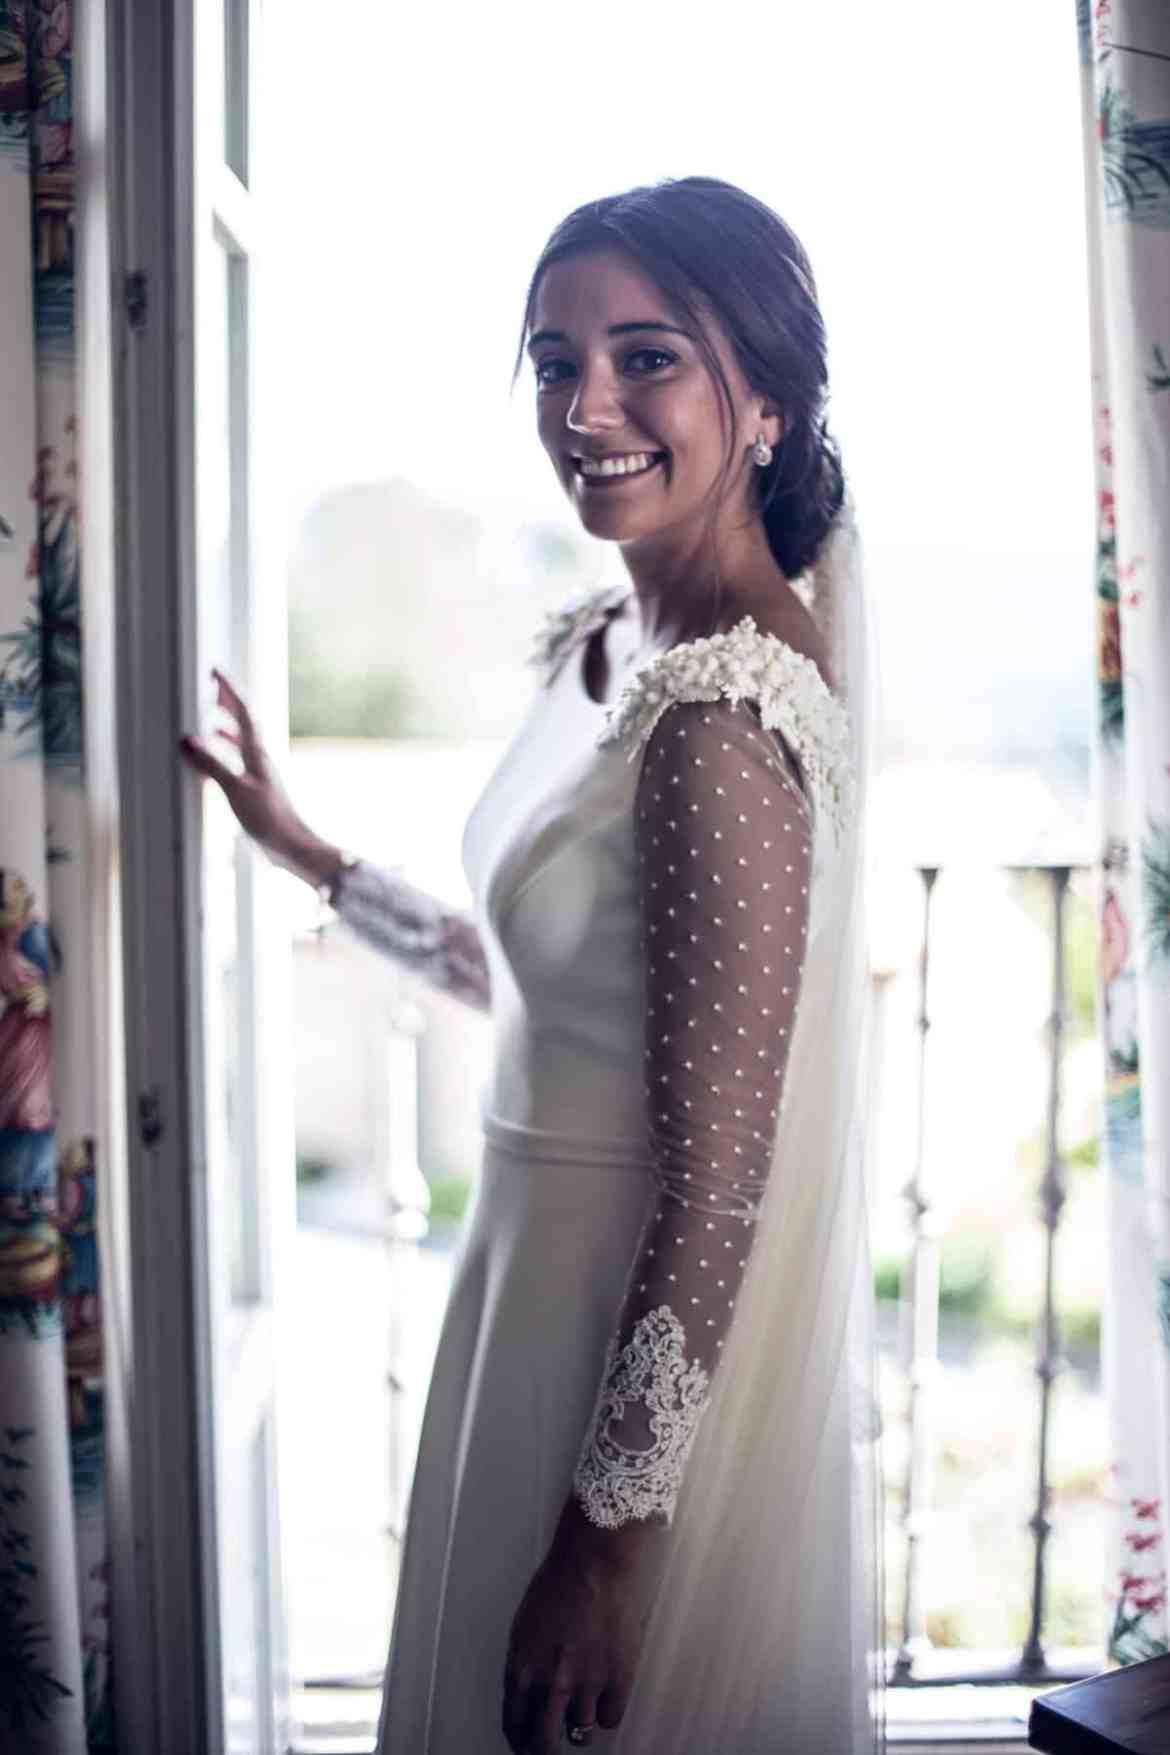 Vestido novia Plumeti Valenzuela Atelier